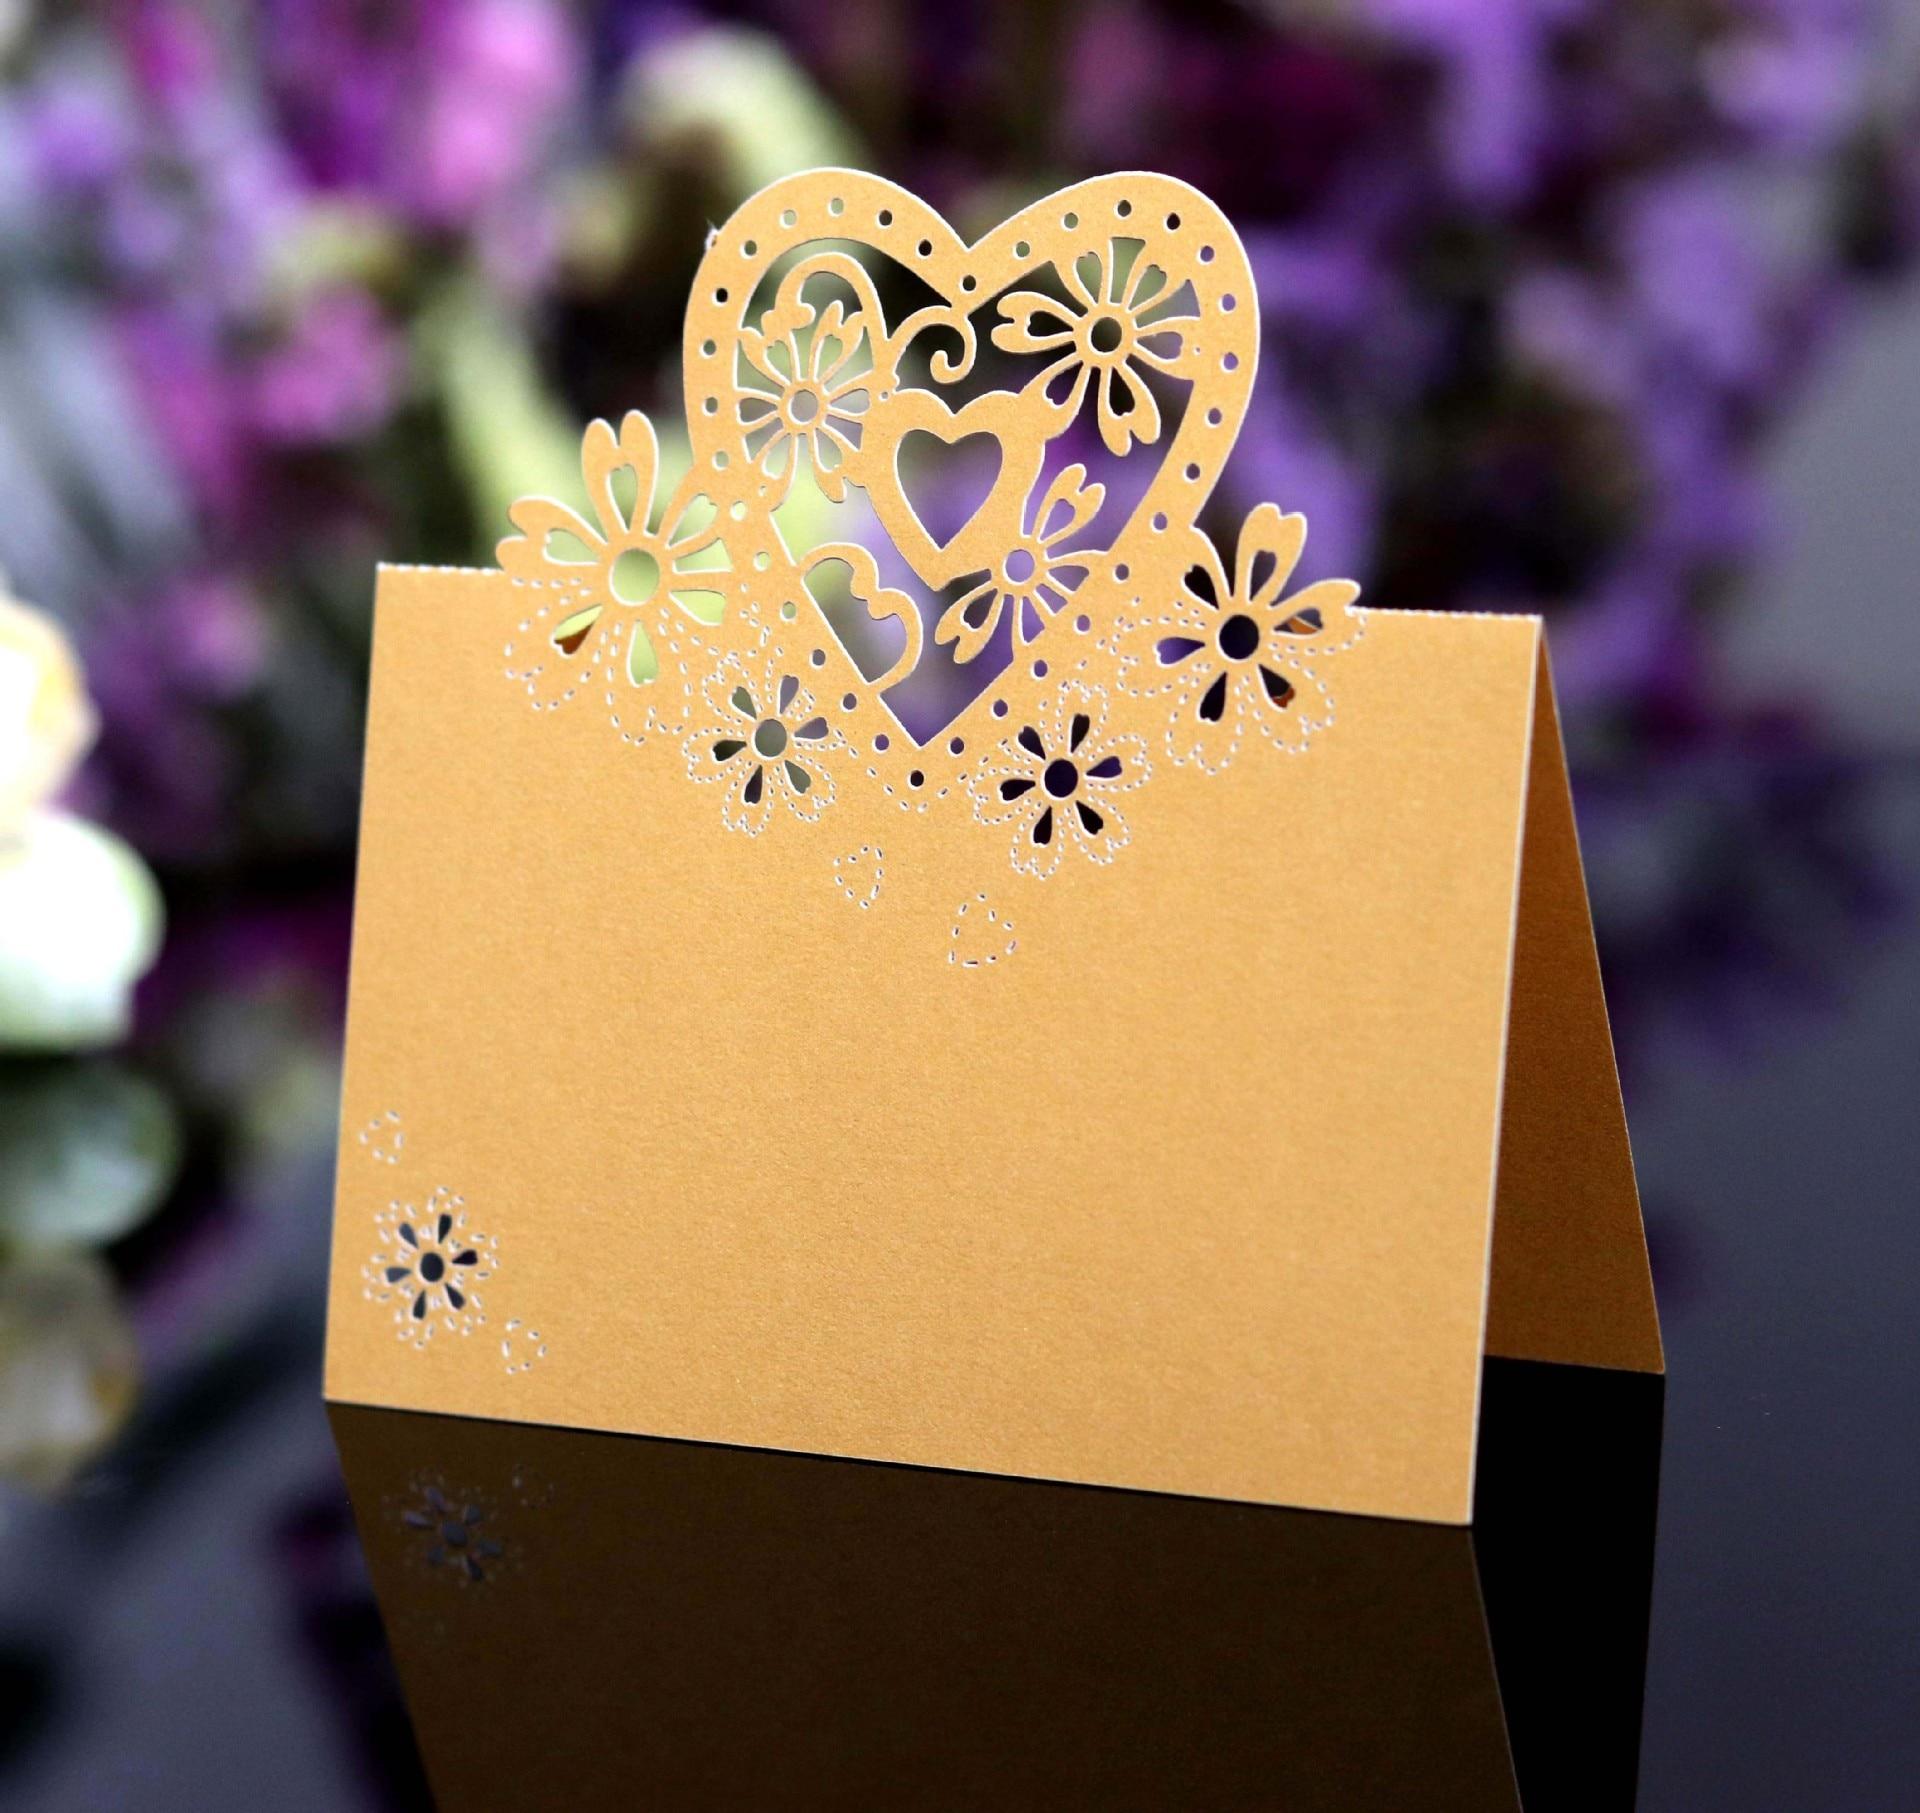 Купить с кэшбэком 50pcs Kawaii Seat Card Vintage Table Butterfly Reception Table Wedding Birthday Laser Cut Heart Place Cards Party Supplies